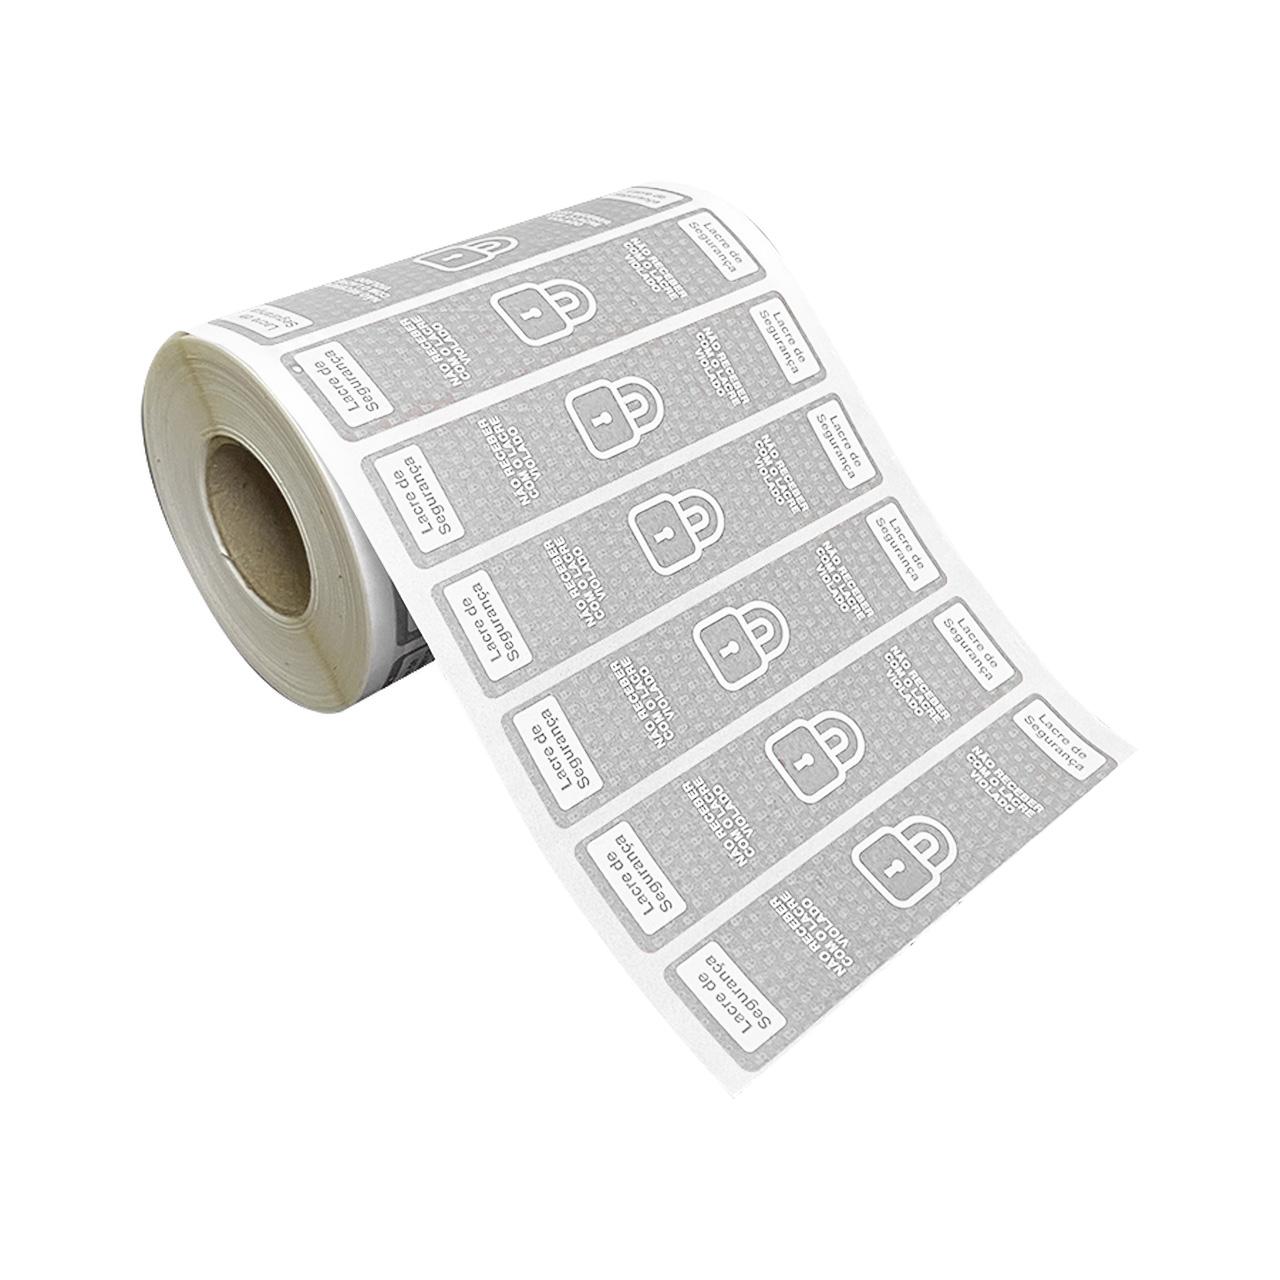 Kit 13 Rolos Etiqueta Lacre Segurança Delivery iFood Alimentos Cinza  - Etiqueta Certa